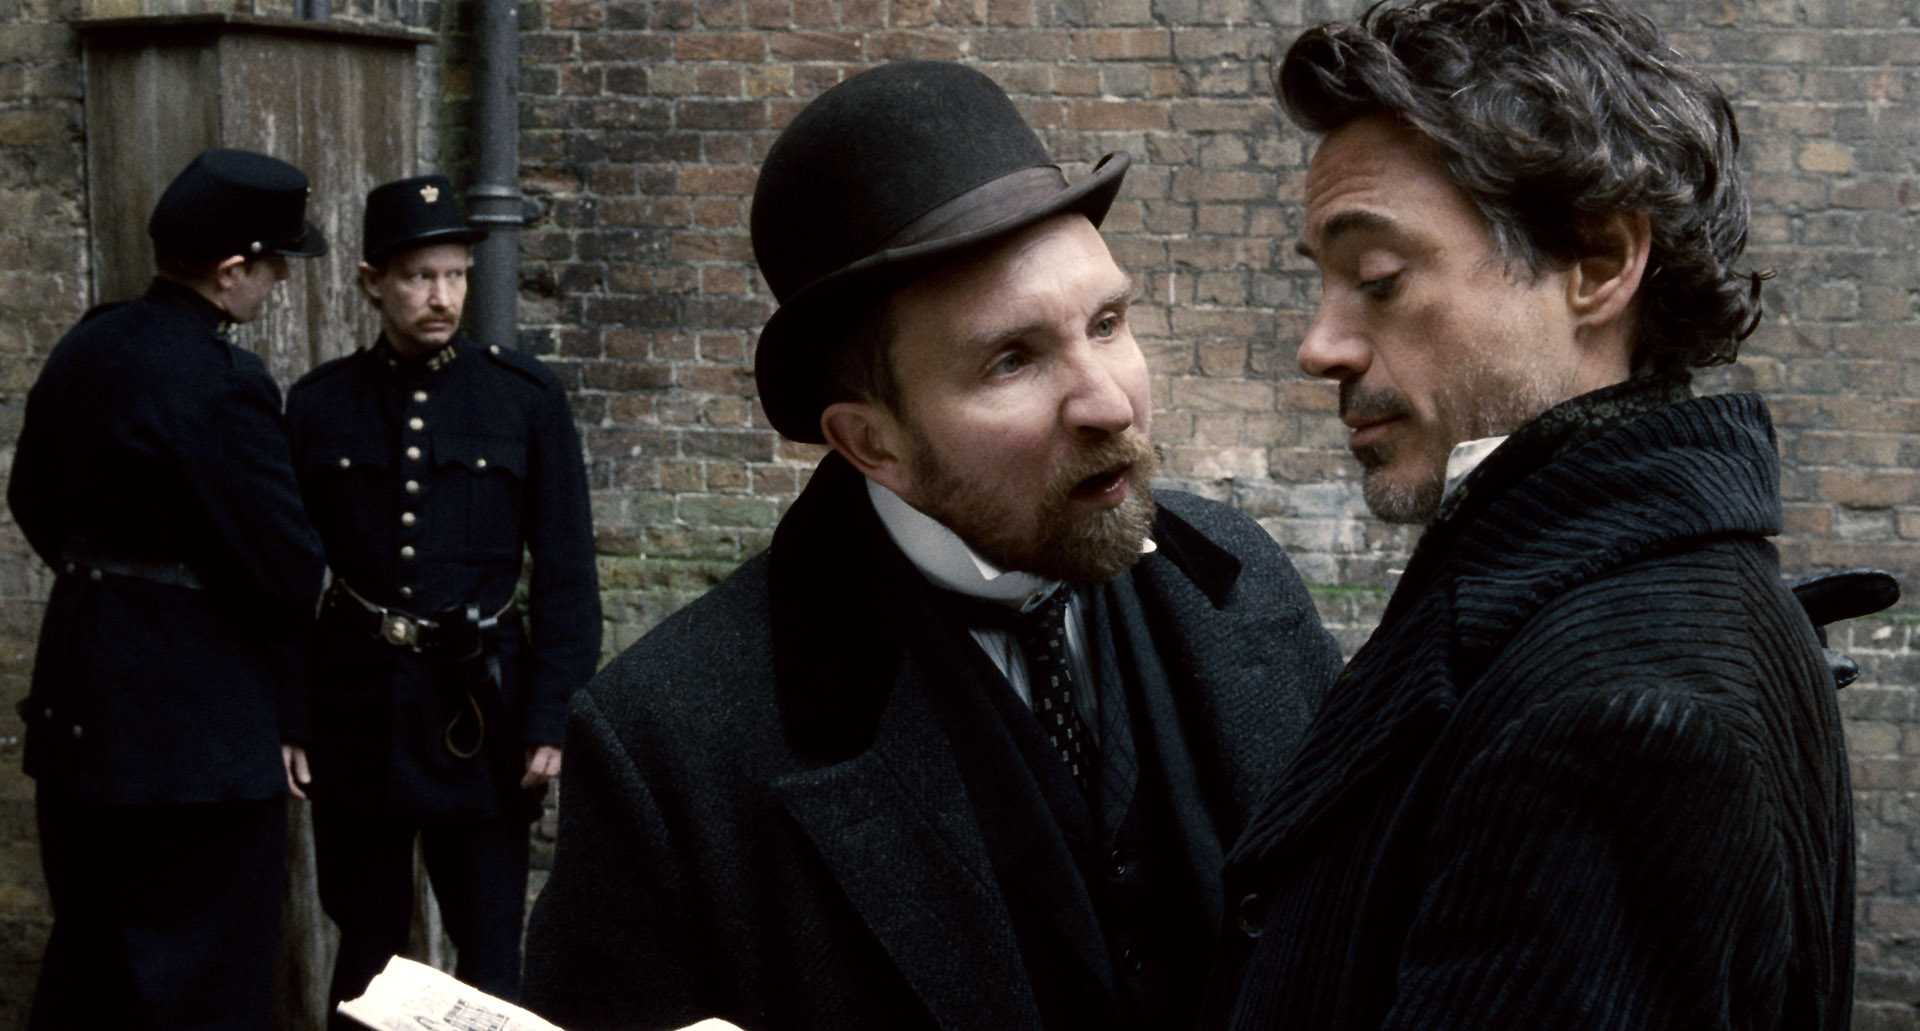 кадры из фильма Шерлок Холмс Эдди Мэрсен, Роберт Дауни-мл.,